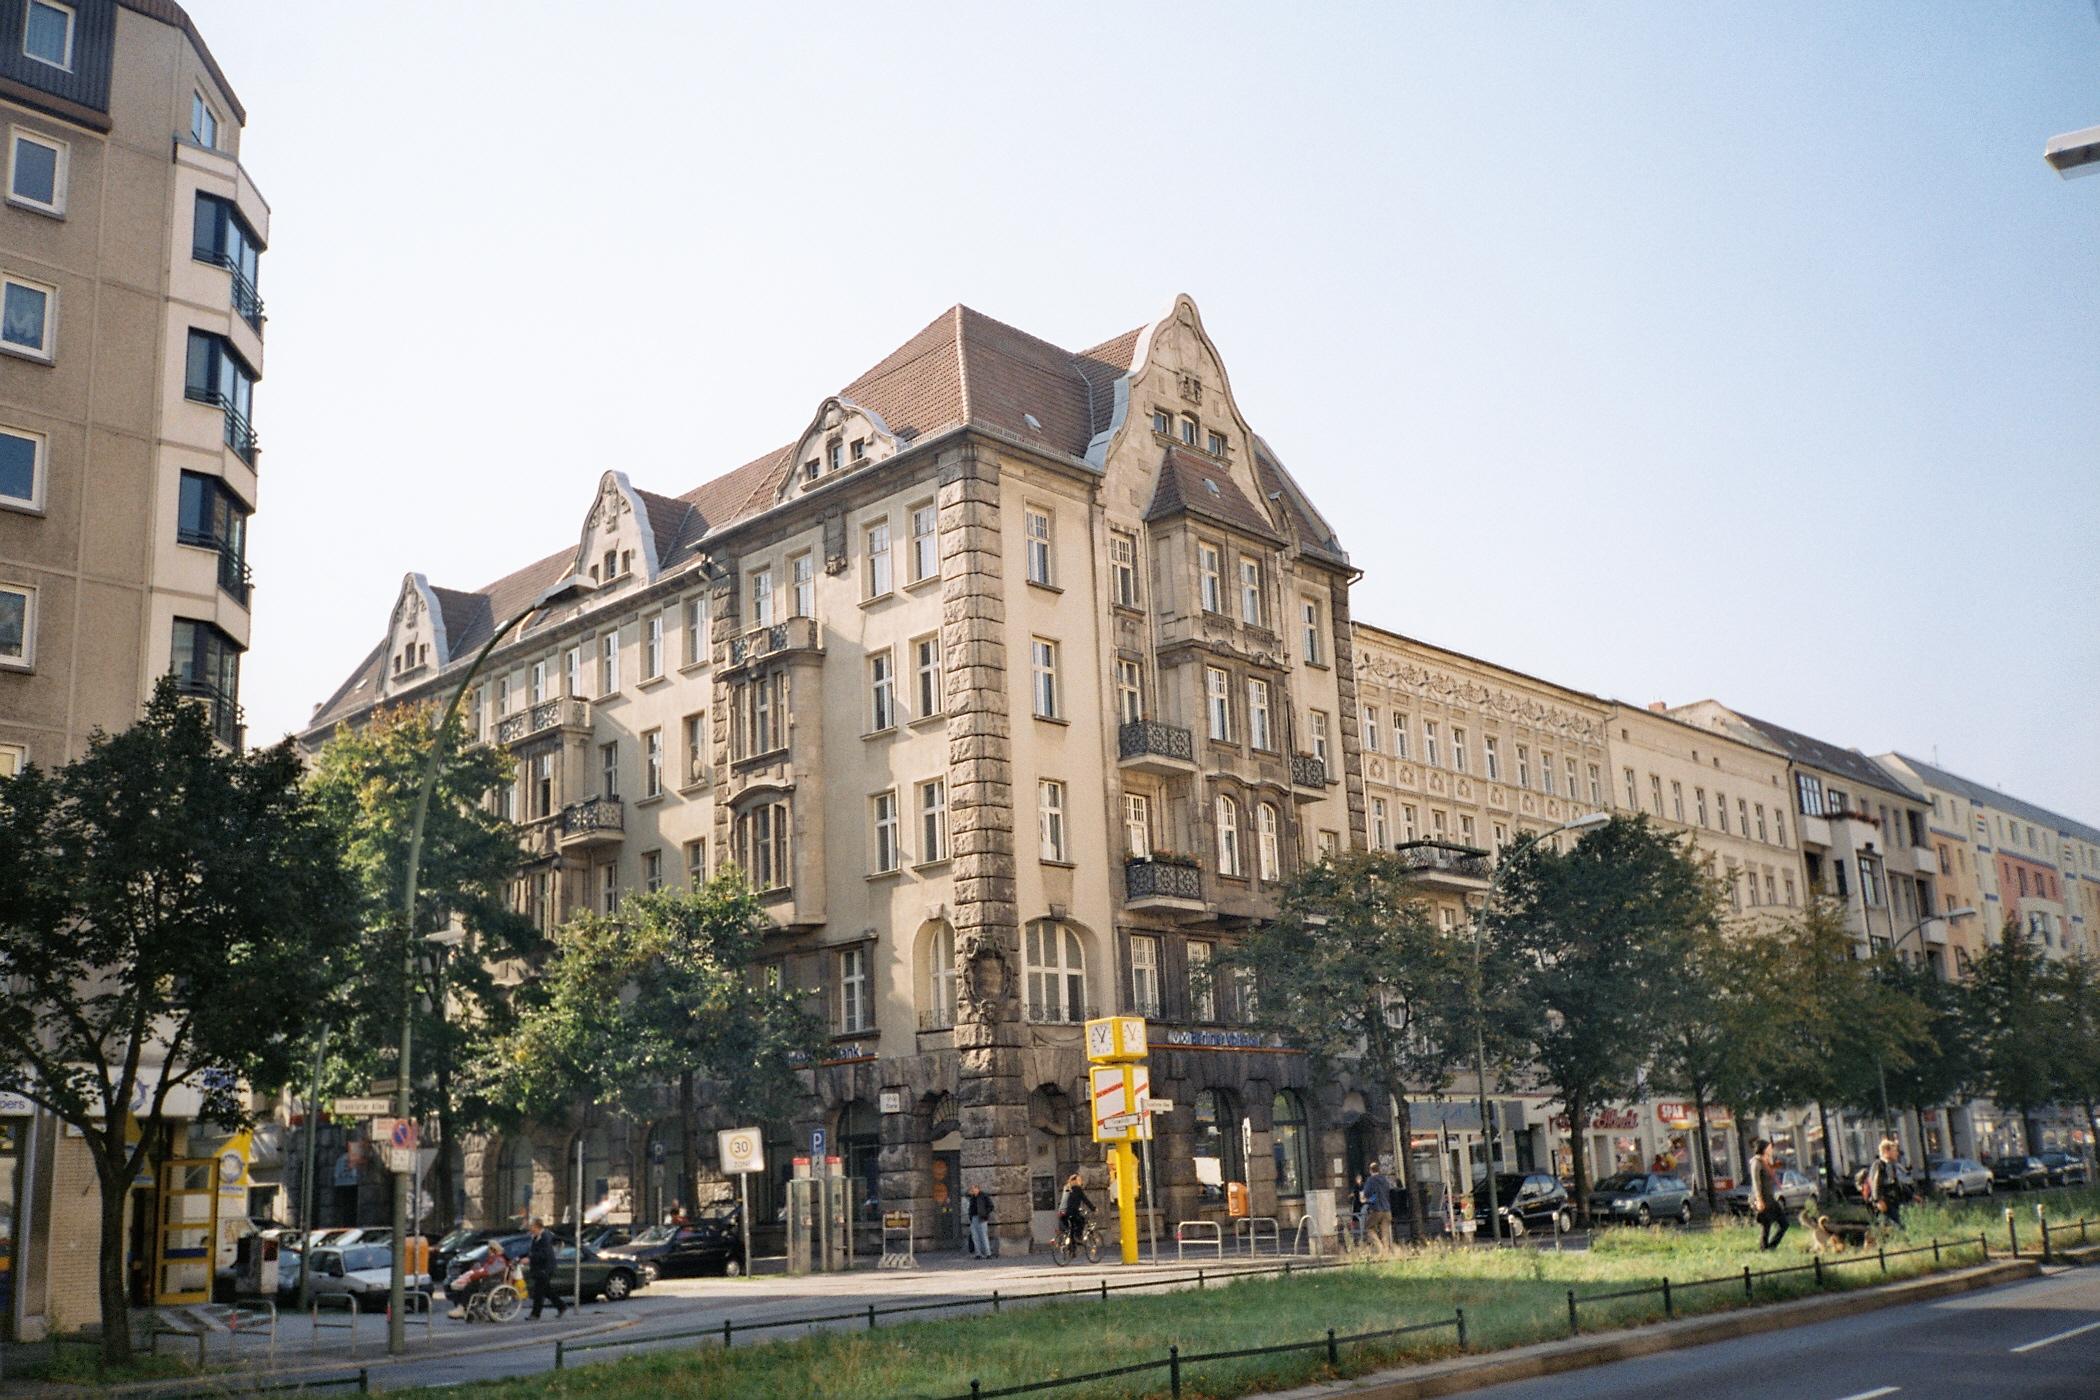 liste der kulturdenkmale in berlin friedrichshain. Black Bedroom Furniture Sets. Home Design Ideas